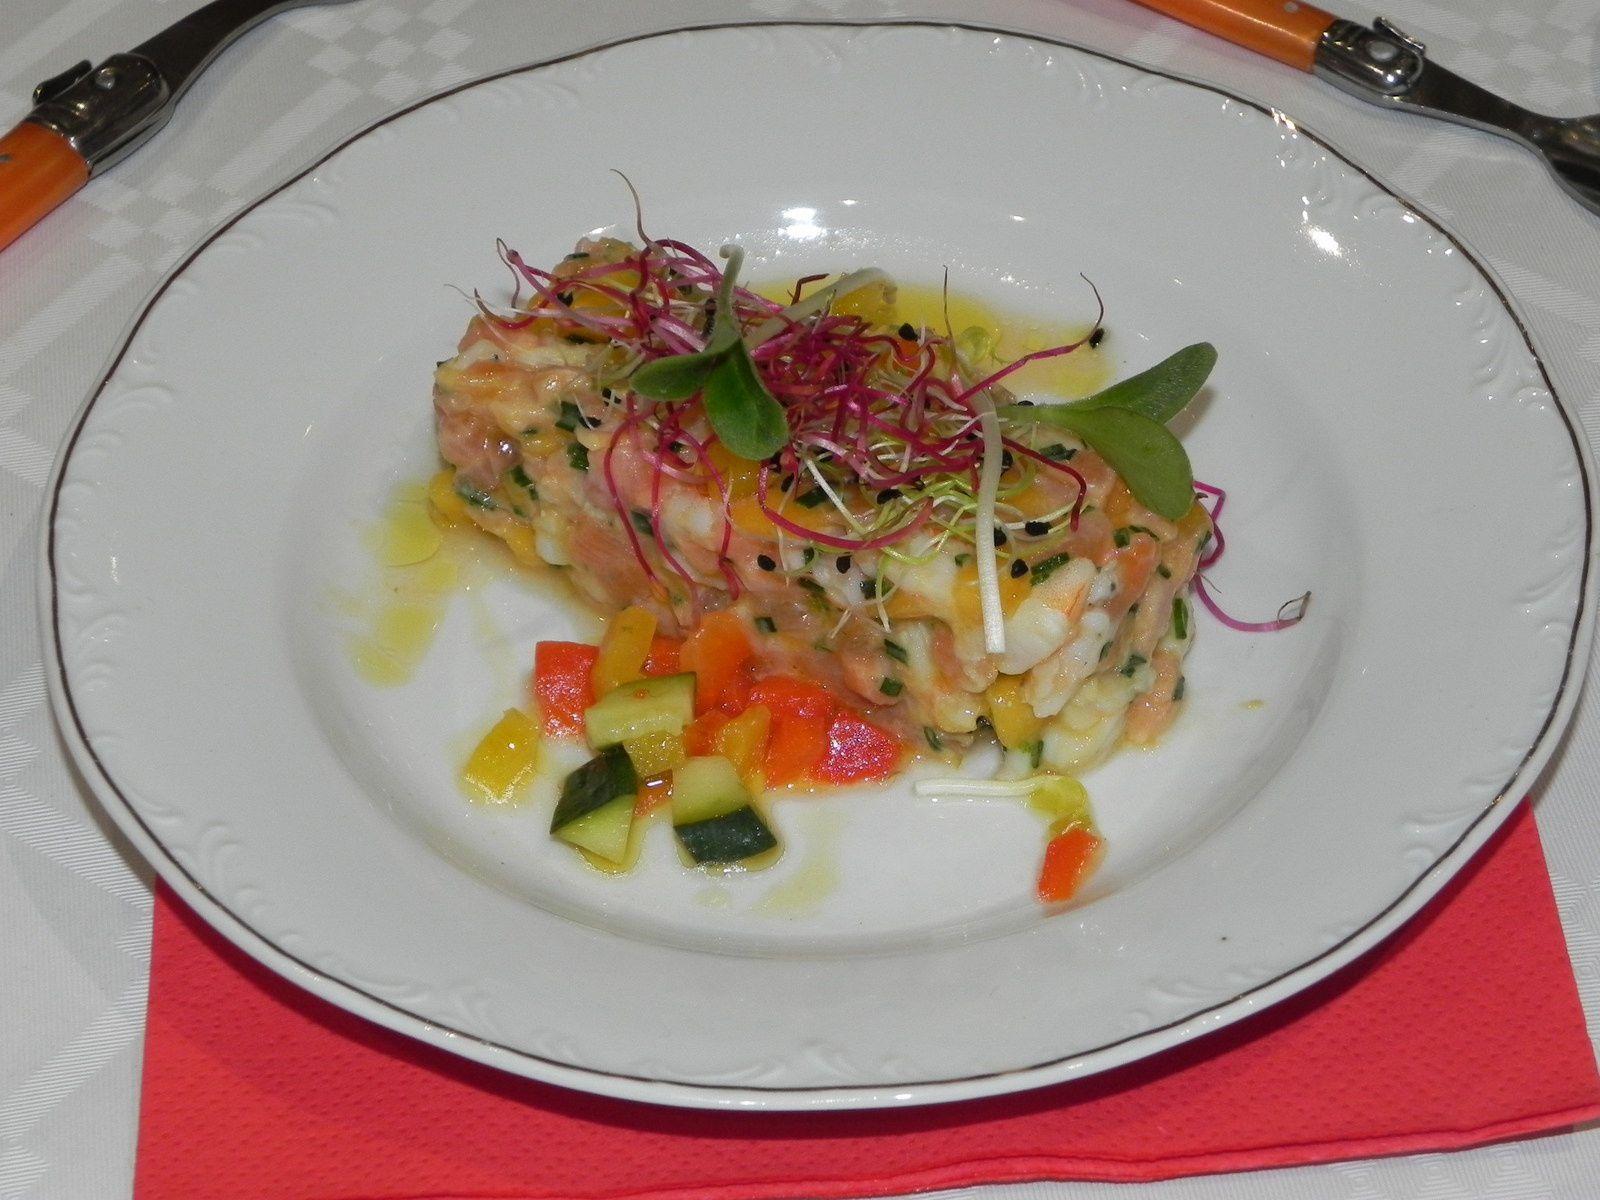 Tartare de crevettes, saumon, mangue, combava et sa vinaigrette arlequin